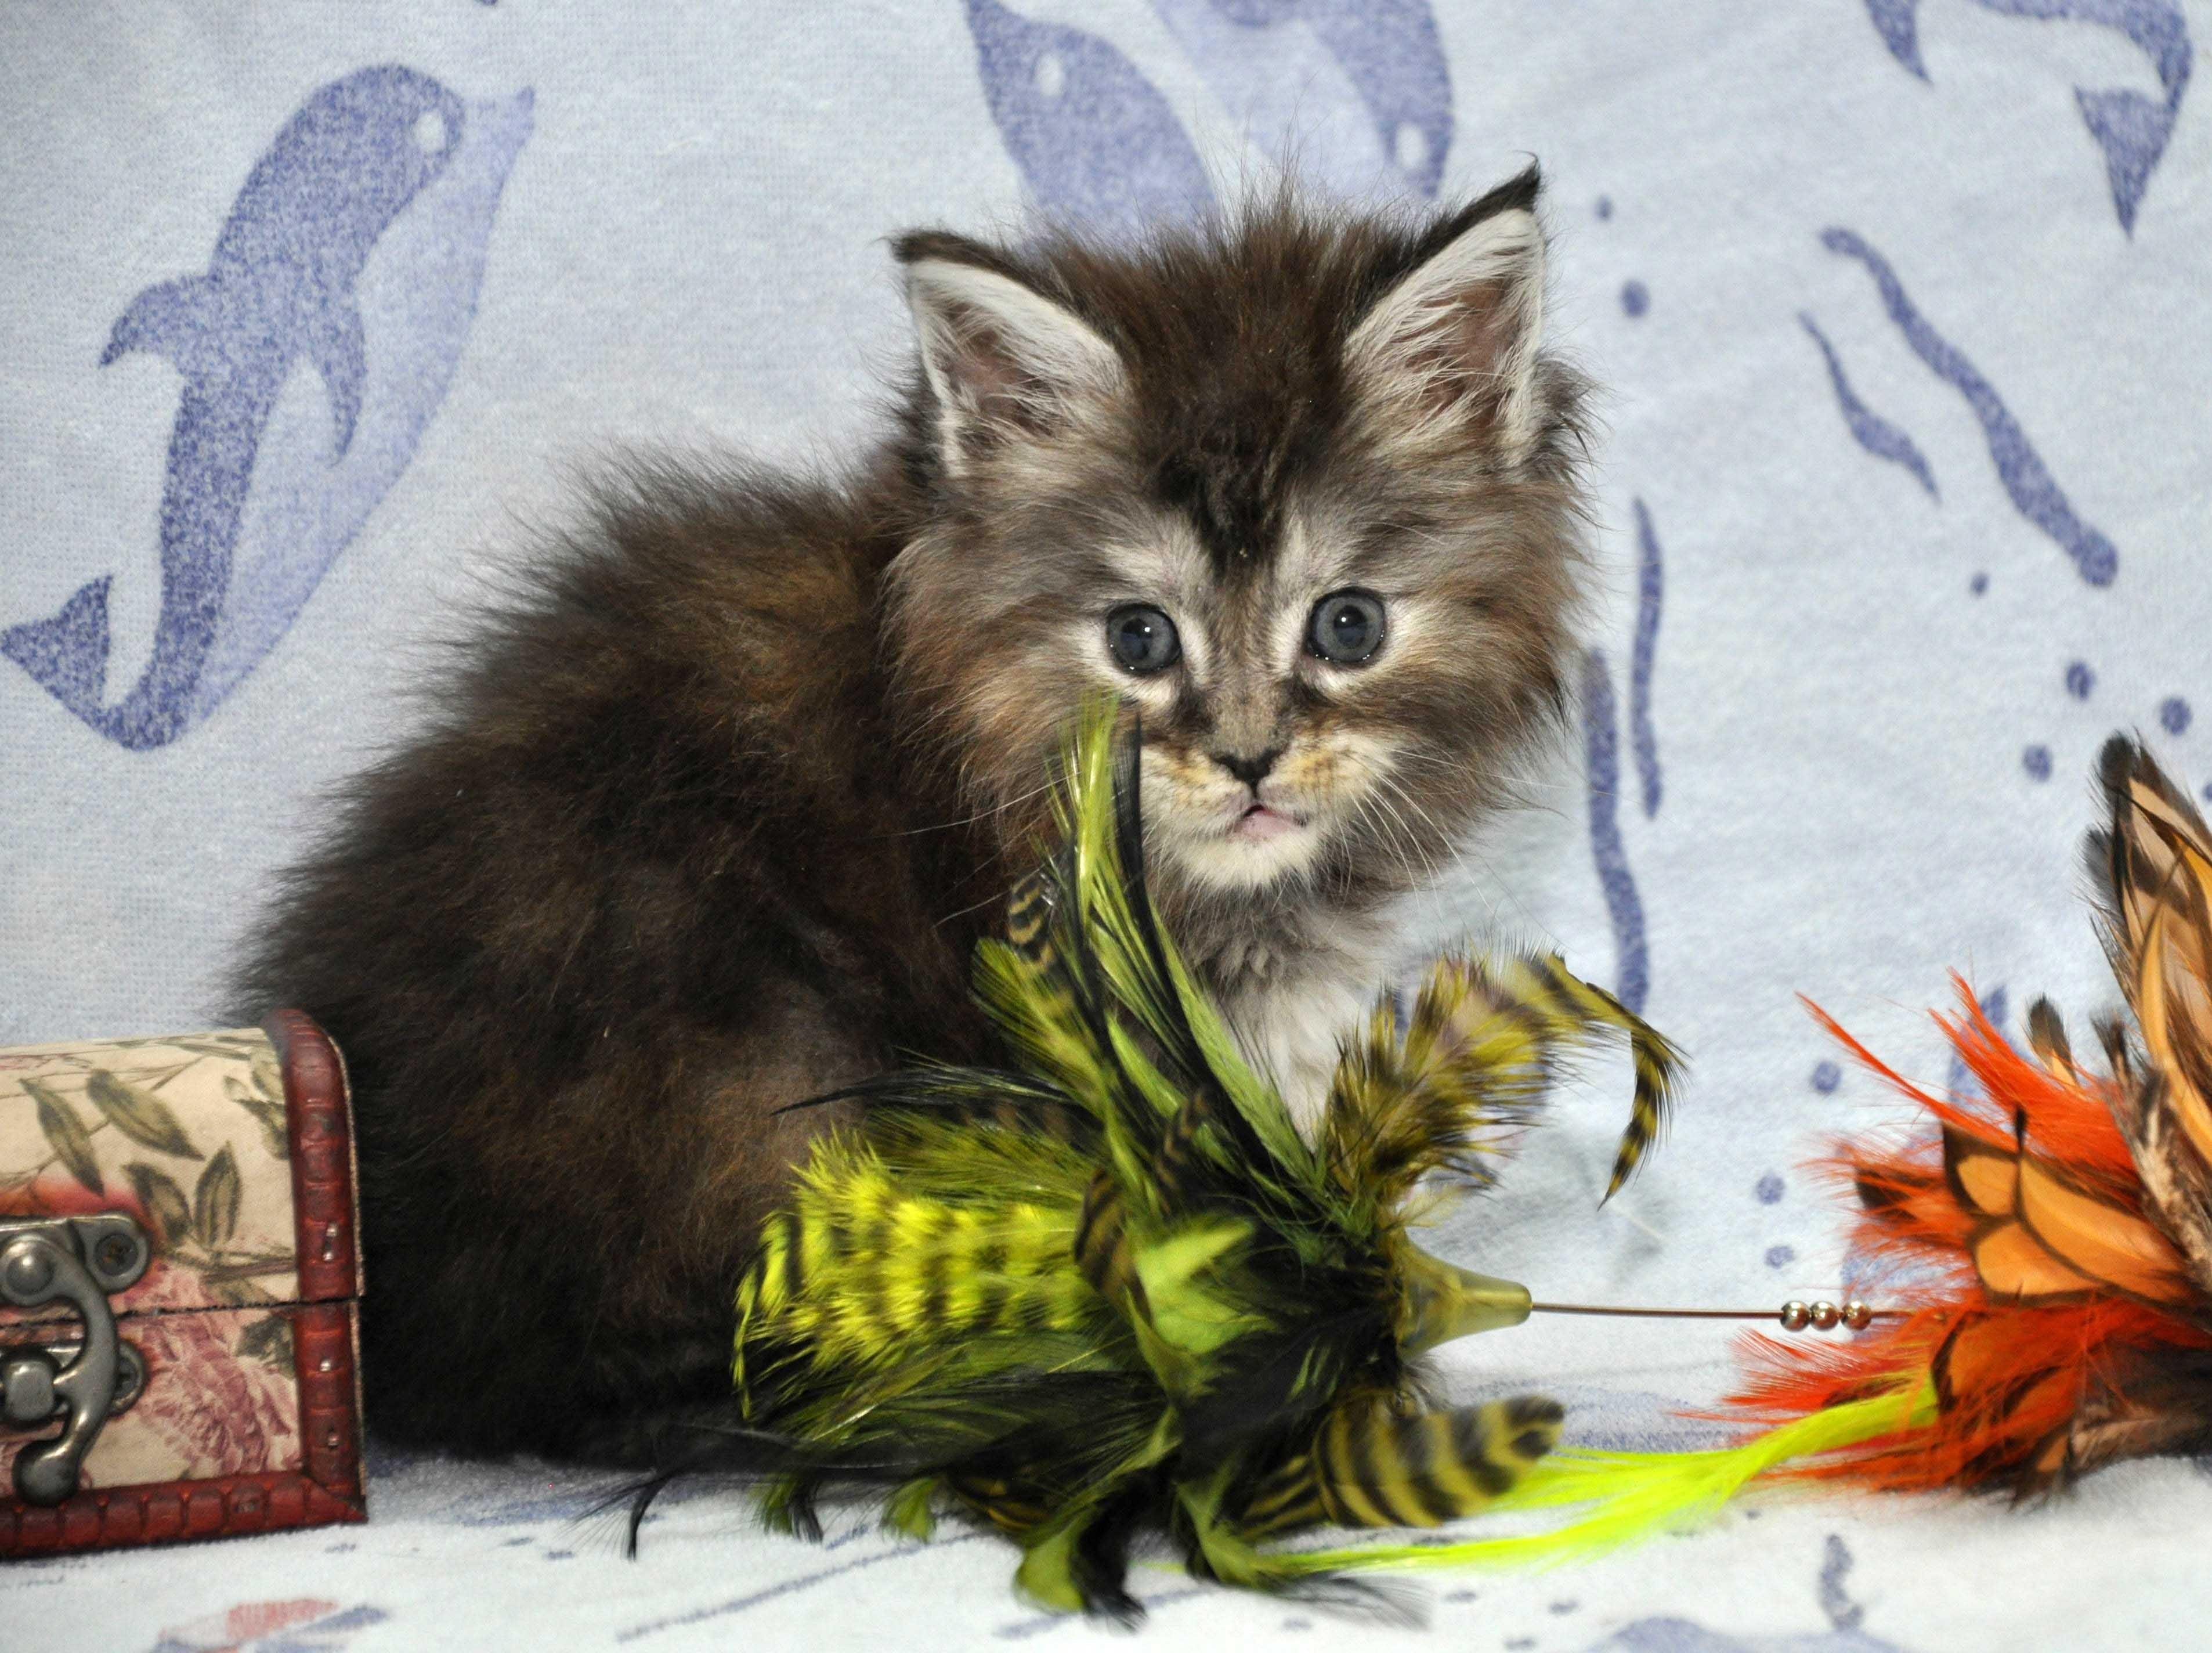 18.11.2017 г.Кошка Мейн Кун 1 female Eyktan P 24122017 foto 3